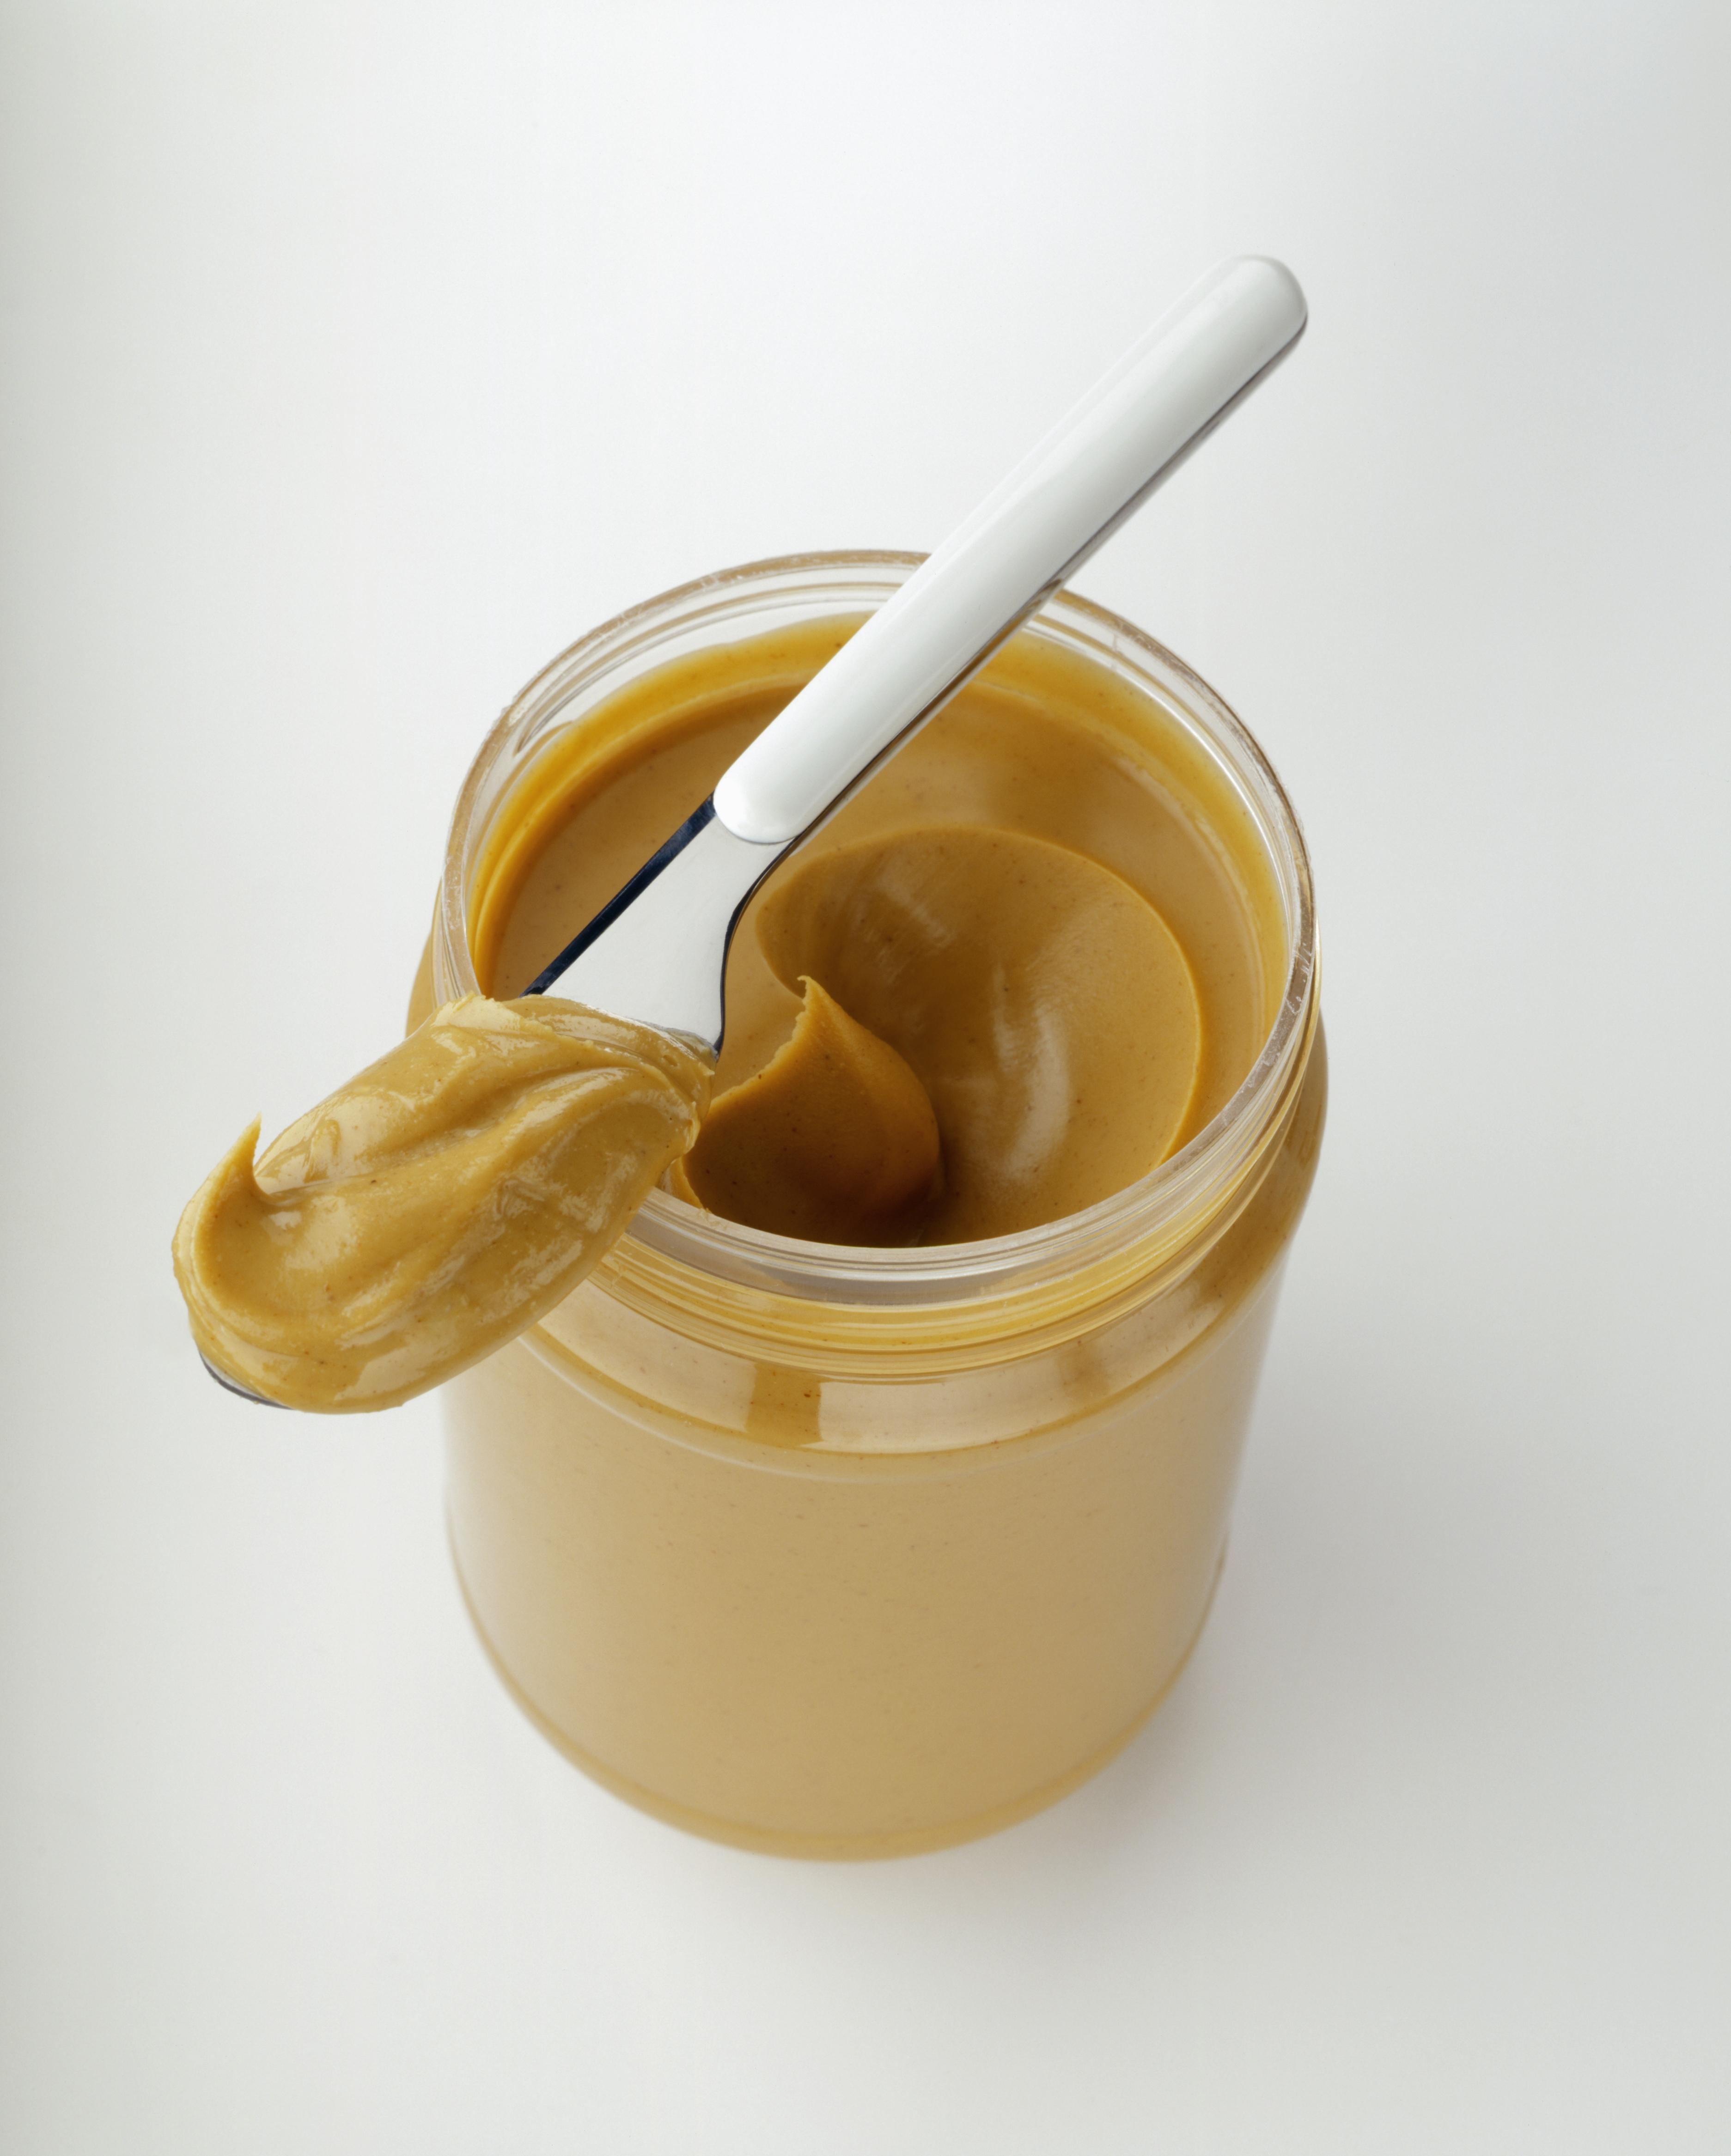 peanut-butter-jar